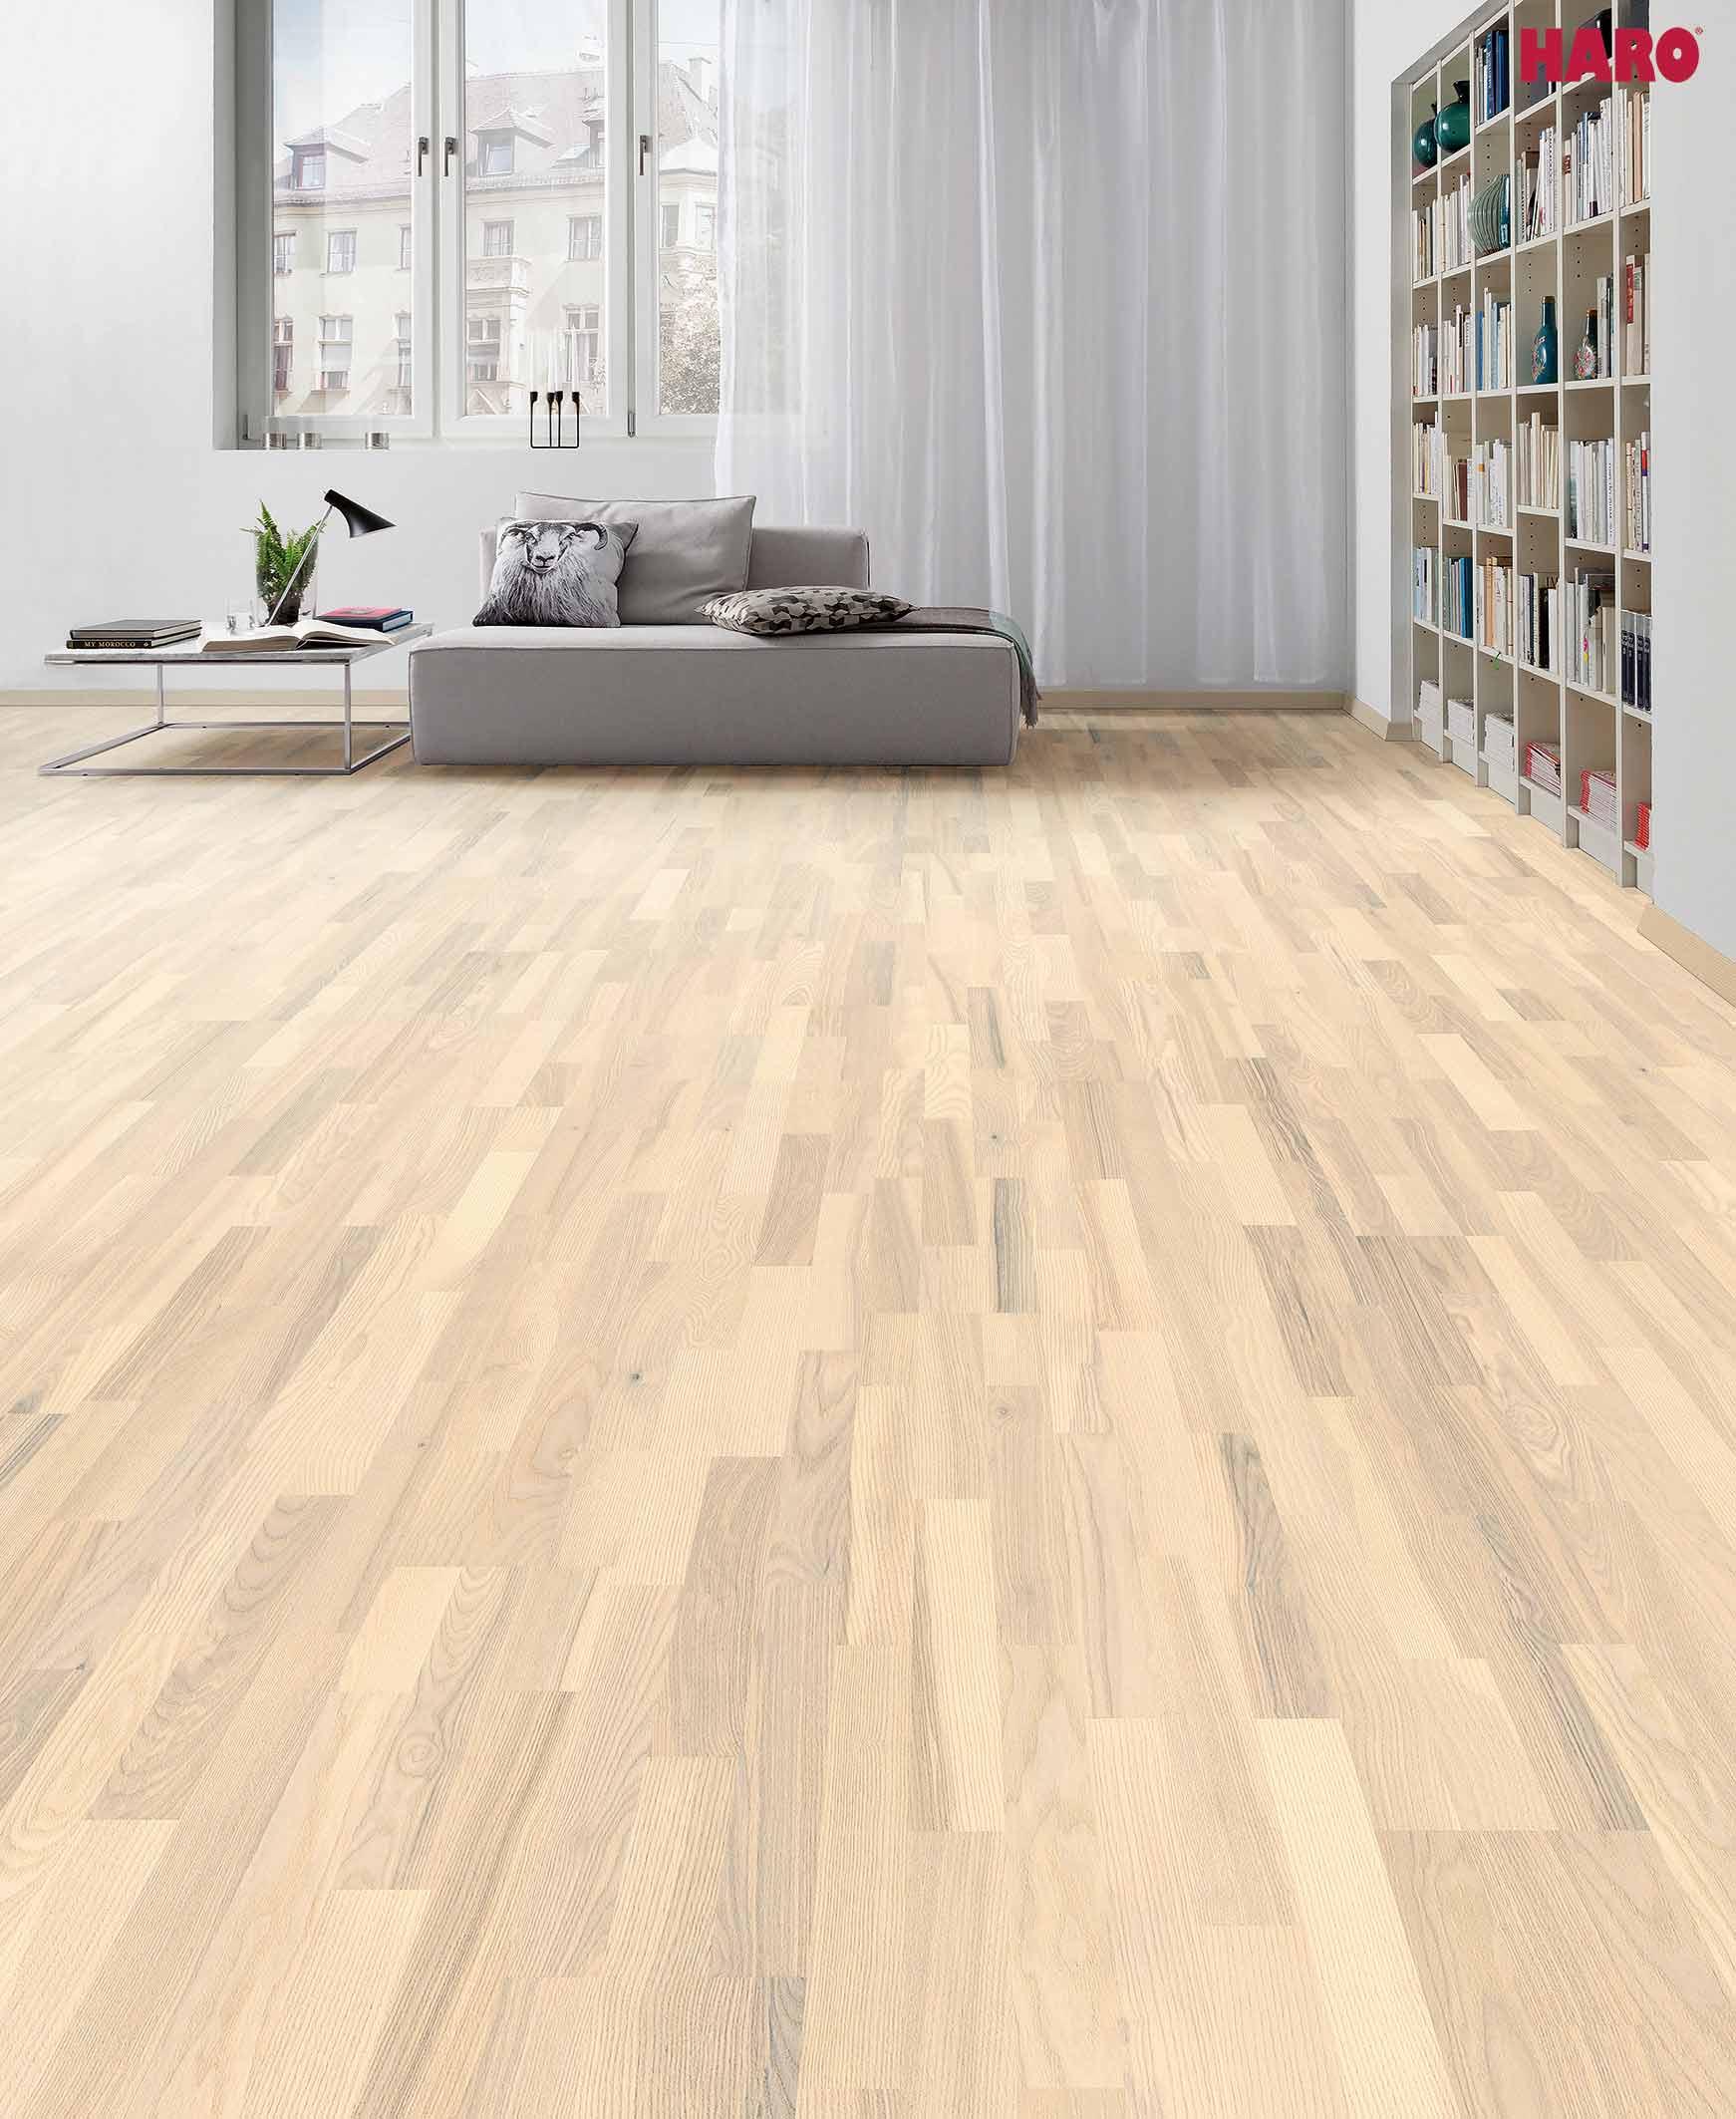 parkett esche online kaufen daedelow parkett. Black Bedroom Furniture Sets. Home Design Ideas